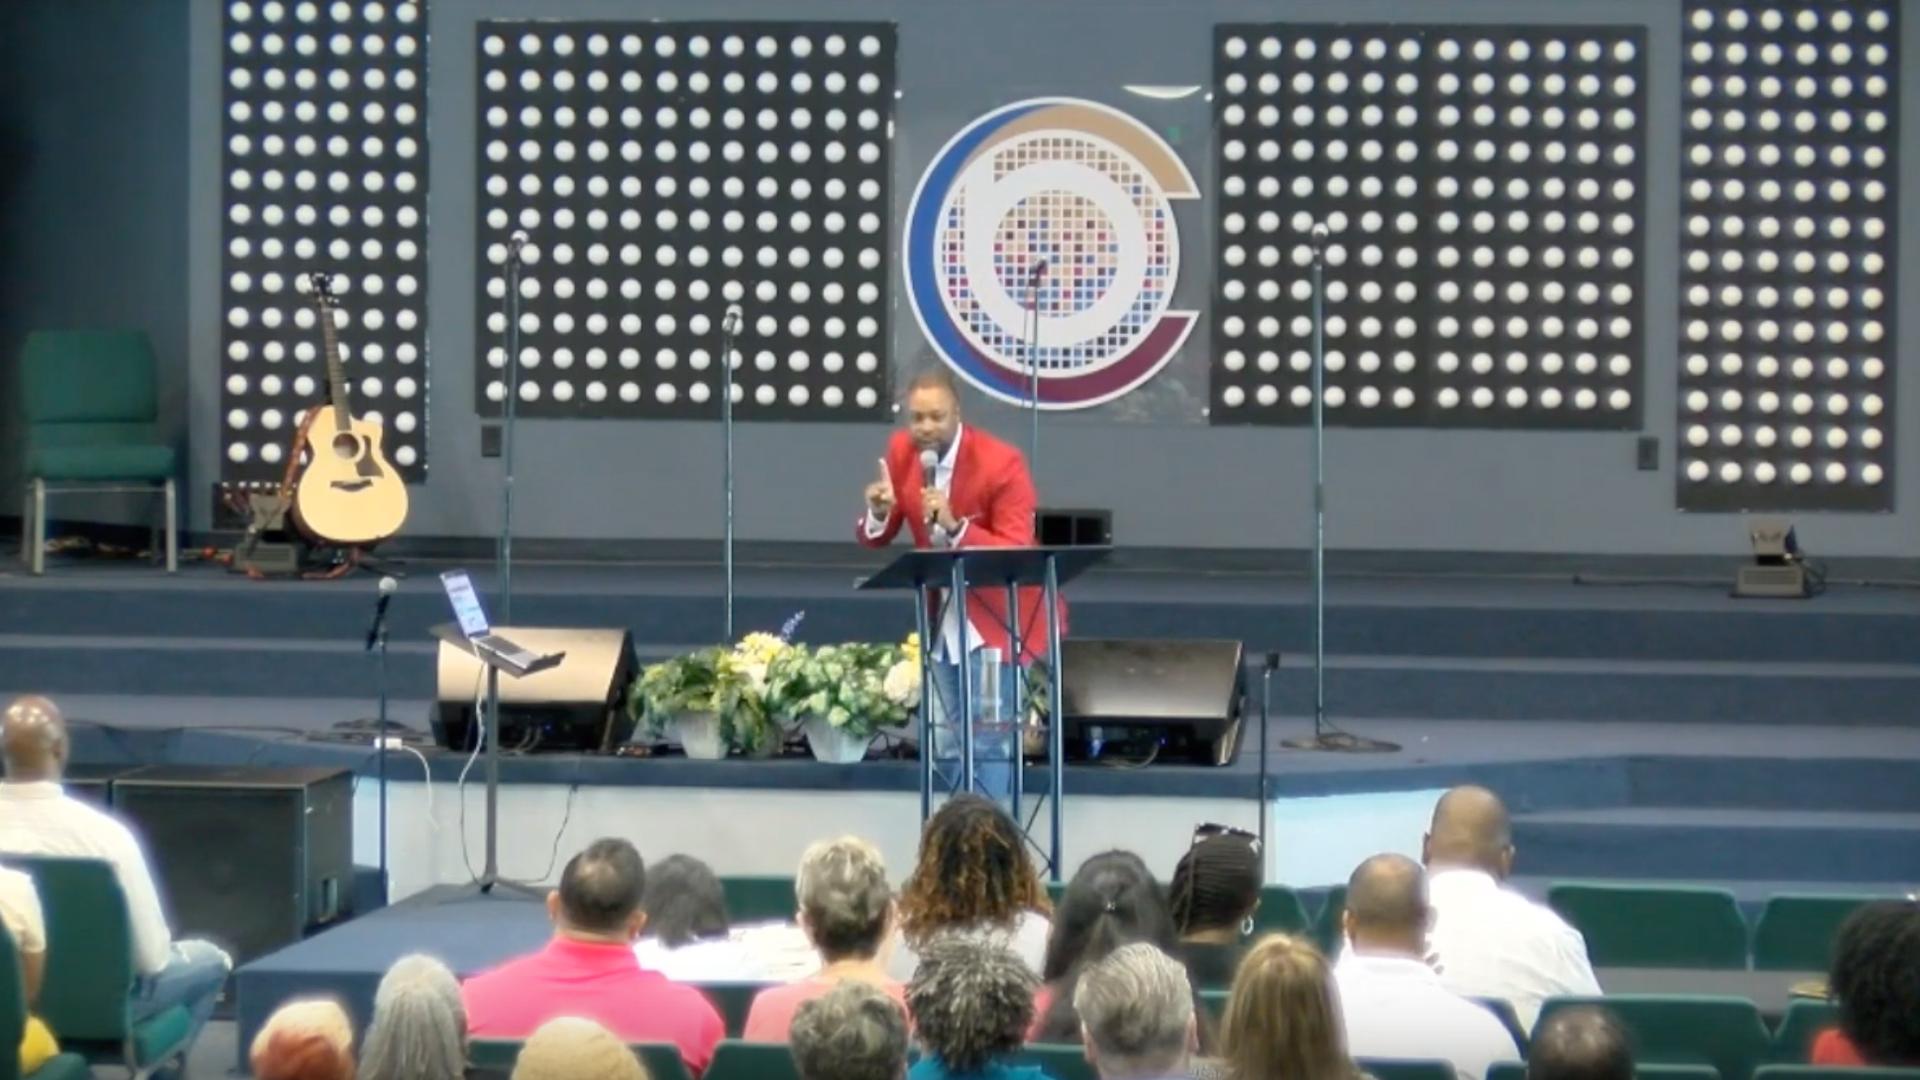 A Walk Through Ephesians #4 - Pastor Darryl Scarbrough - June 23, 2019